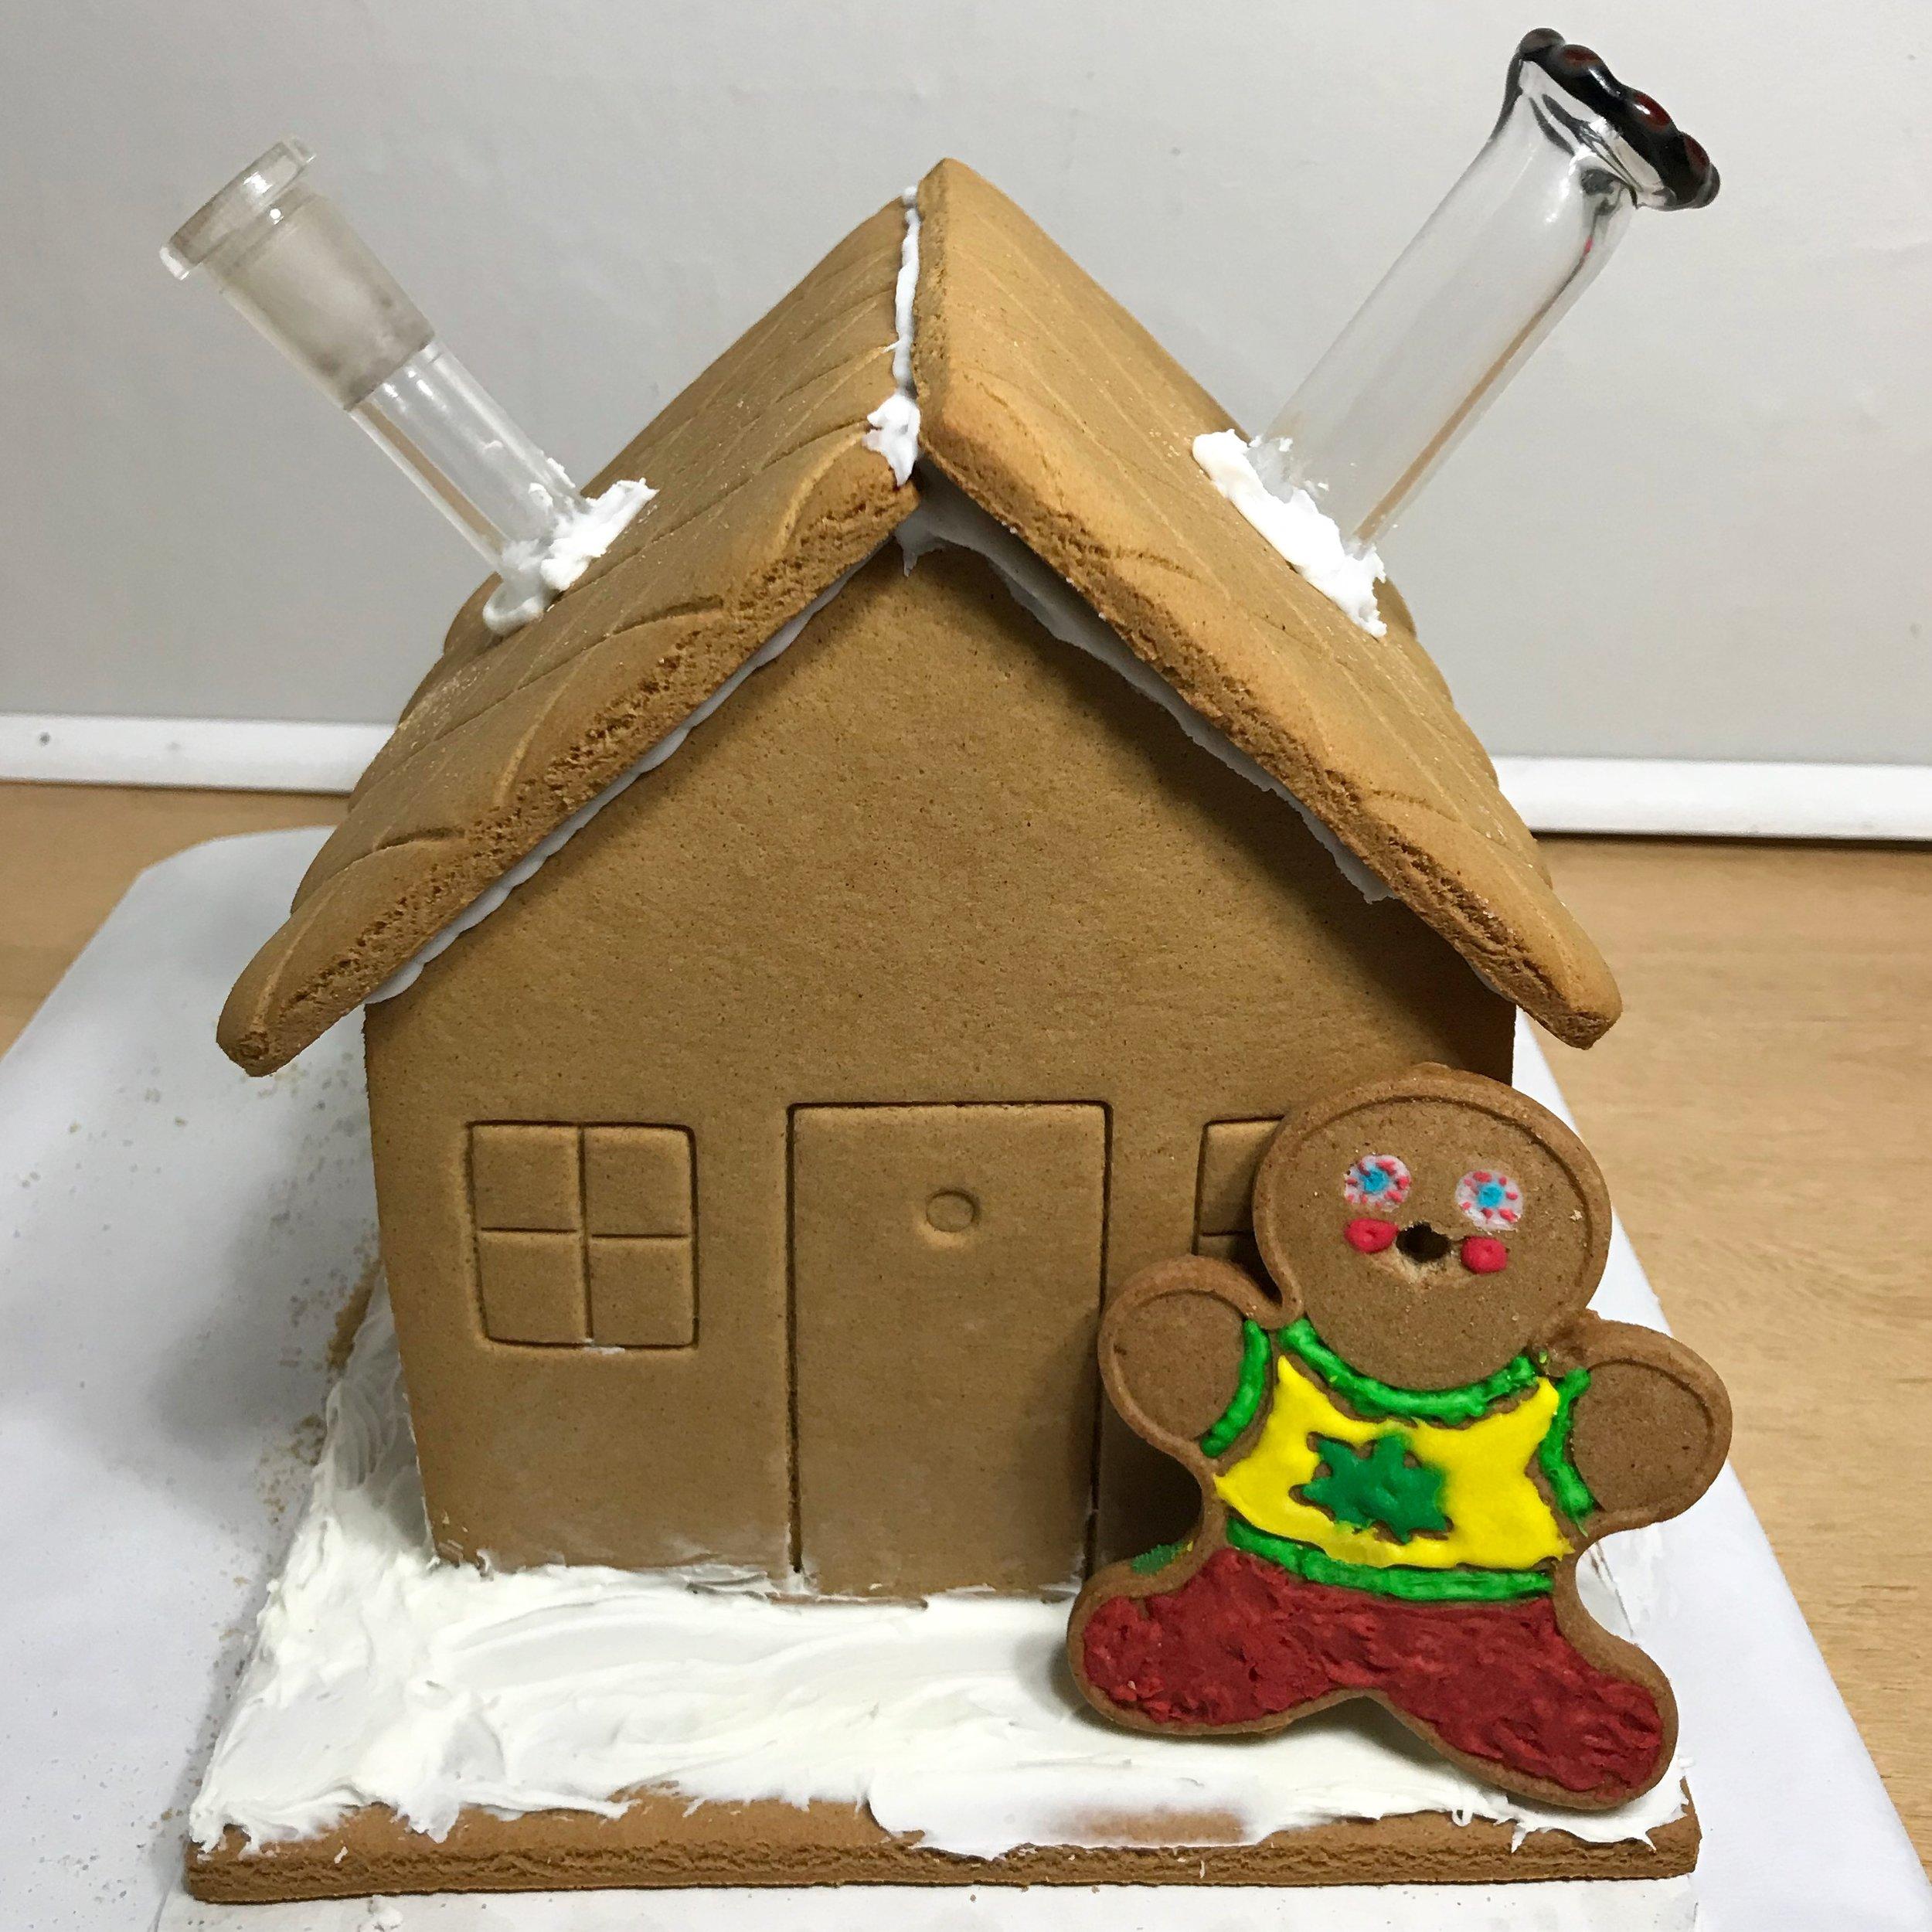 Stoner Christmas- Gingerbread House Bong